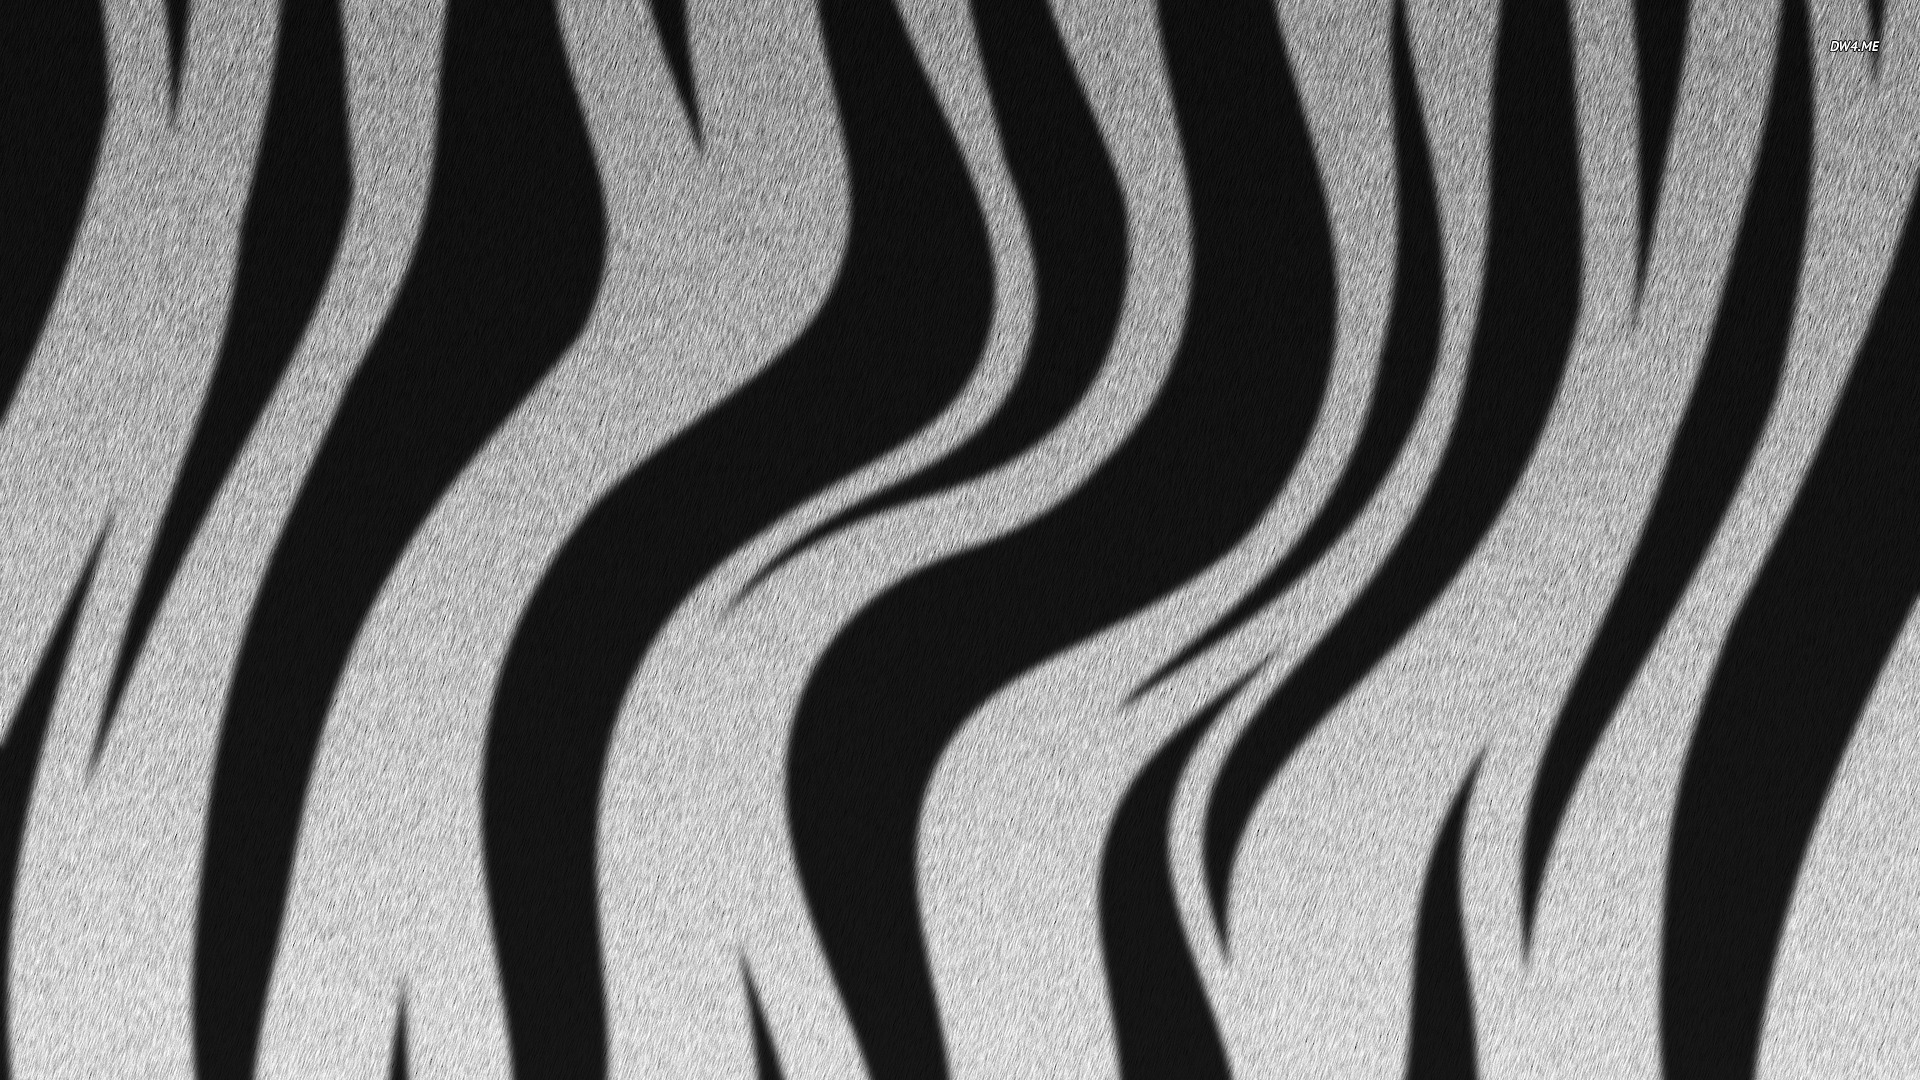 Zebra stripes wallpaper   Digital Art wallpapers   752 1920x1080